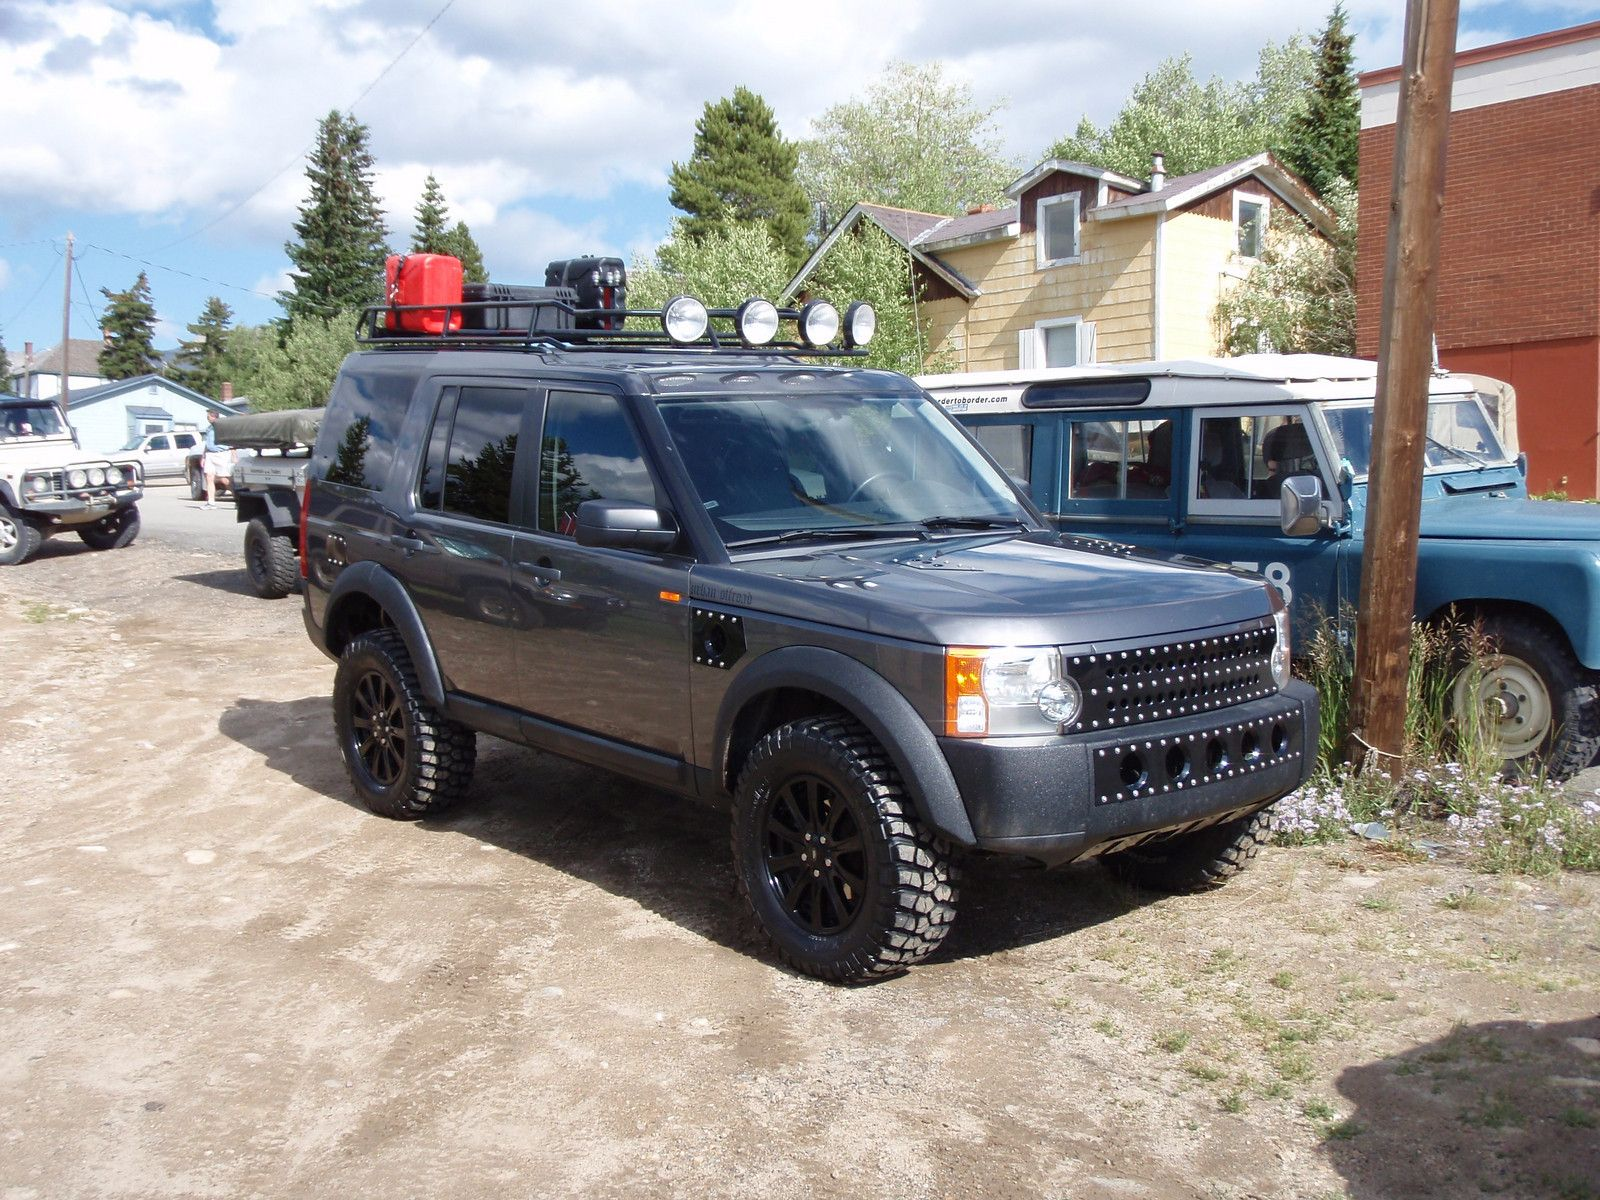 Range Rover Dallas >> urbran off road lr3 | Land Rover LR4 | Pinterest | Roads